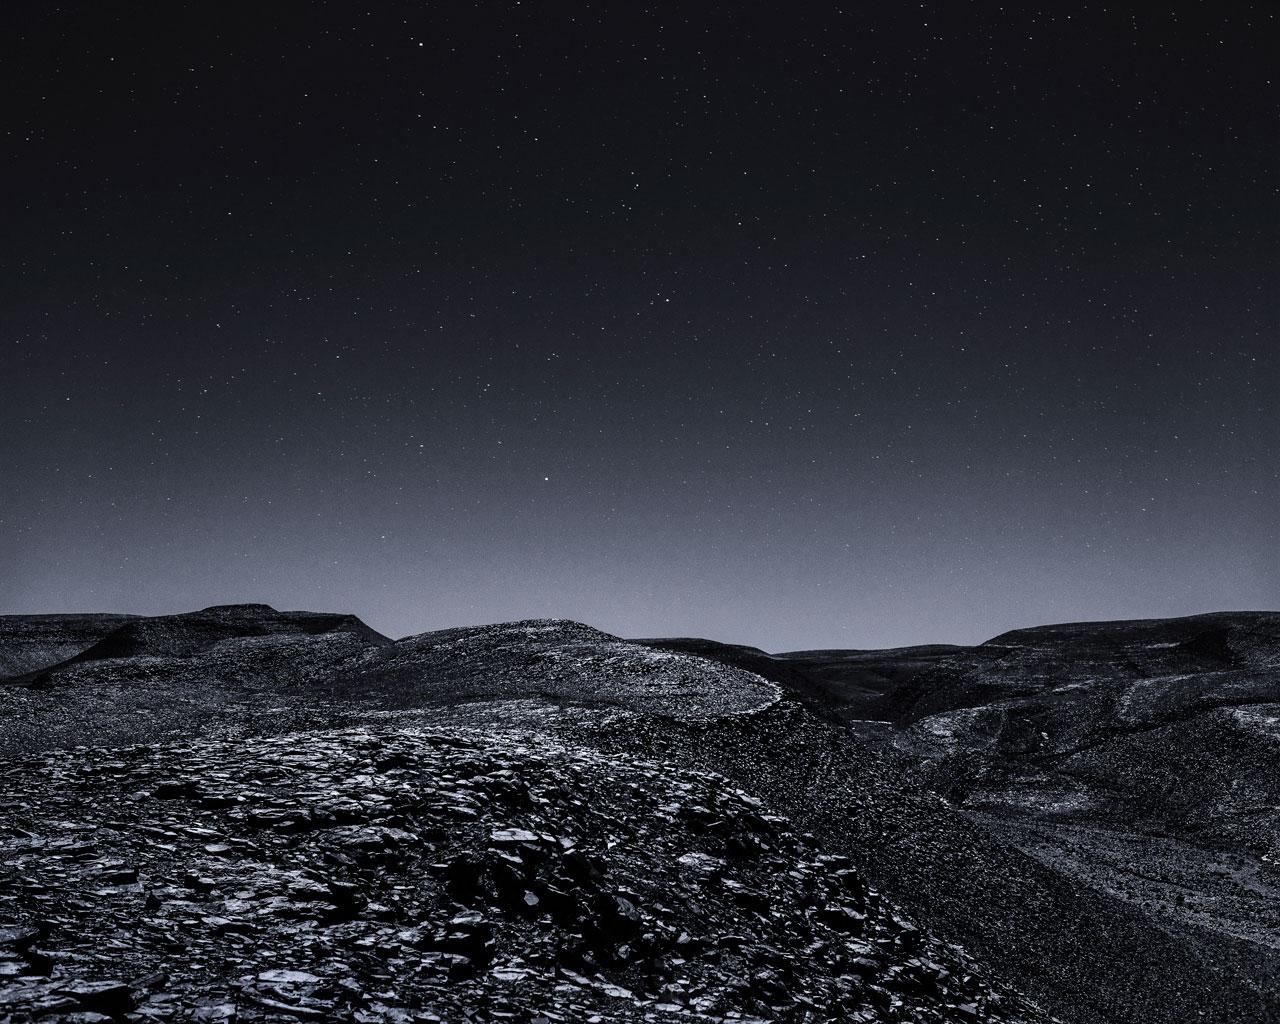 Andrej Glusgold - Limbo - Felix Schoeller Photoaward